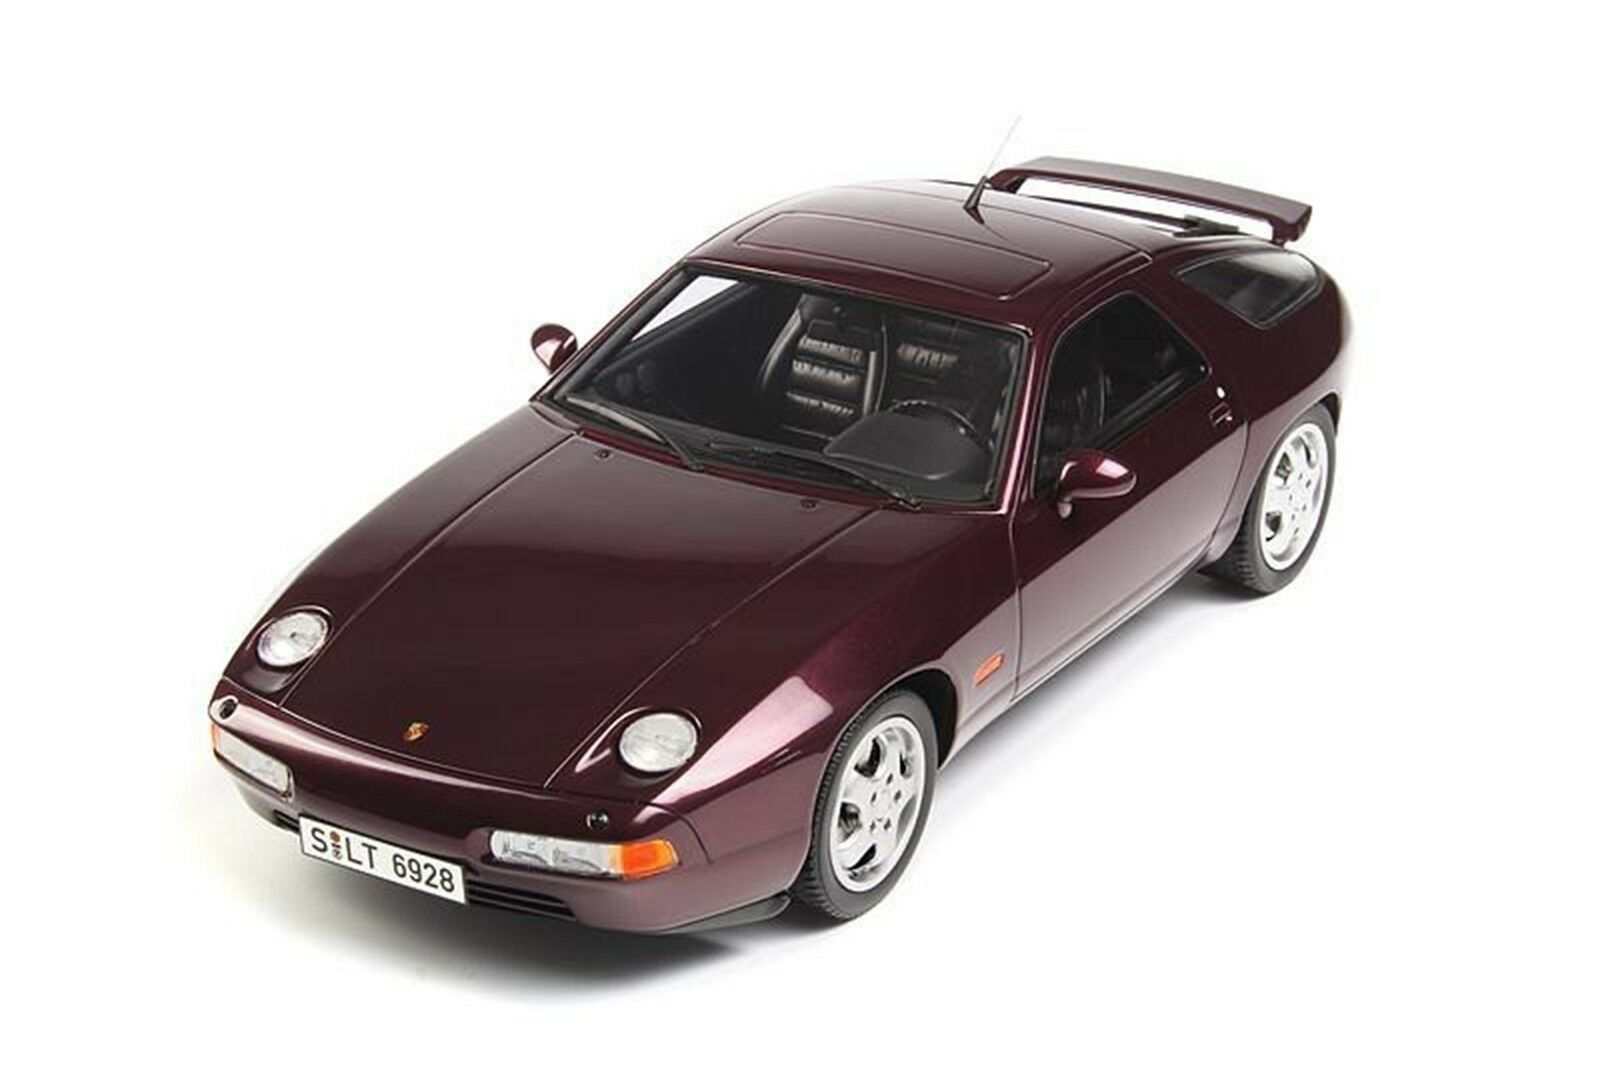 GT Ande 1992 Porsche 928 GTS Burgundy Färg LE of 500 Super Sällsynt